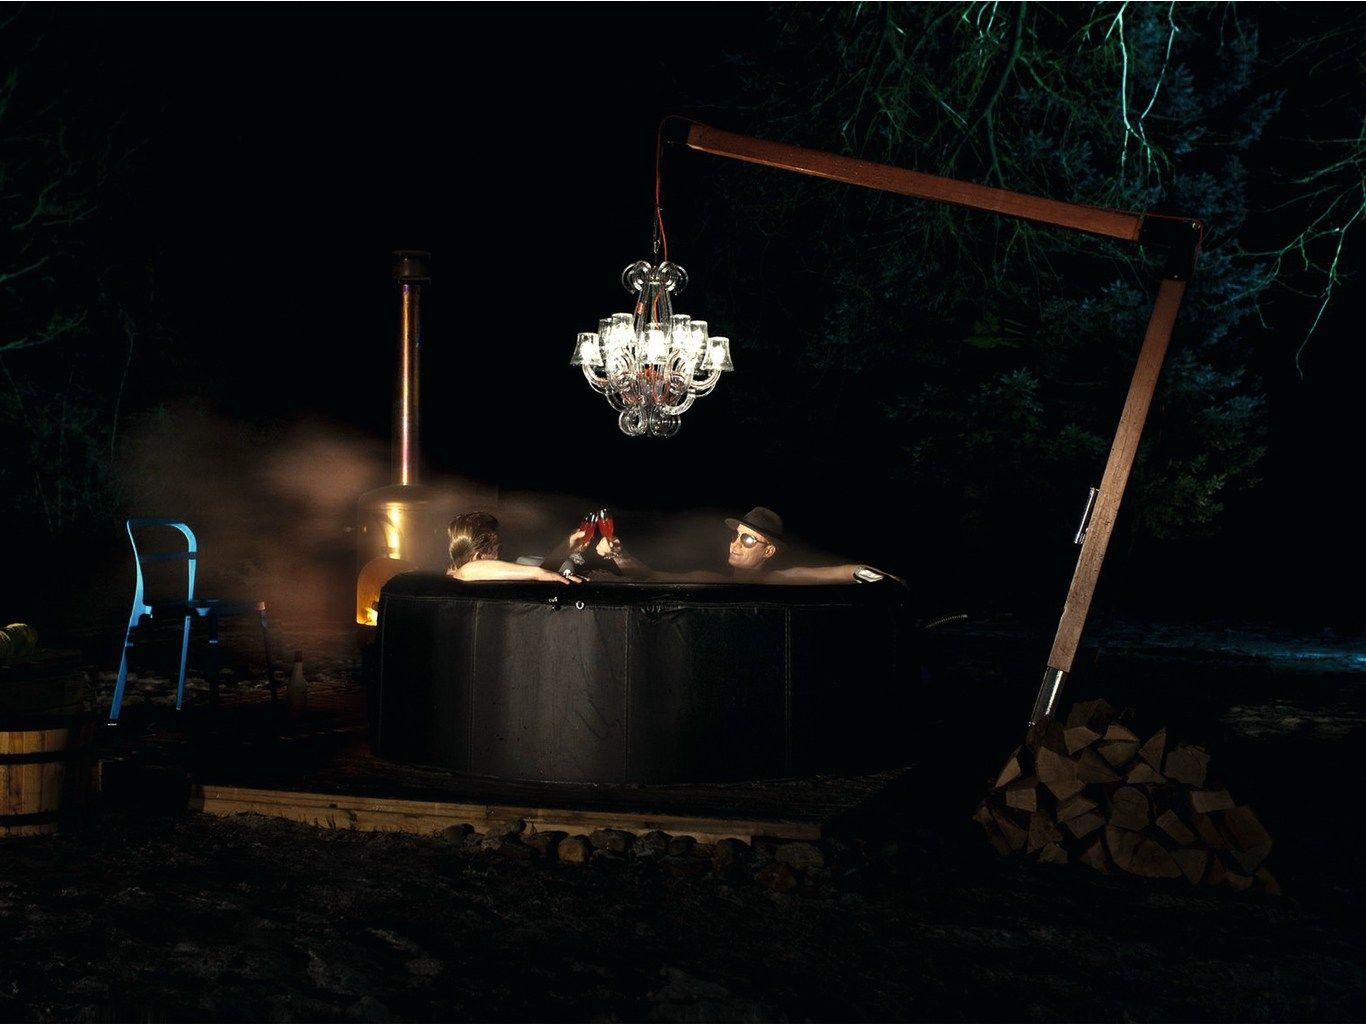 Led Polycarbonate Pendant Lamp Rockcoco By Fatboy Italia Design Demakersvan Contemporary Outdoor Furniture Pendant Lamp Chandelier